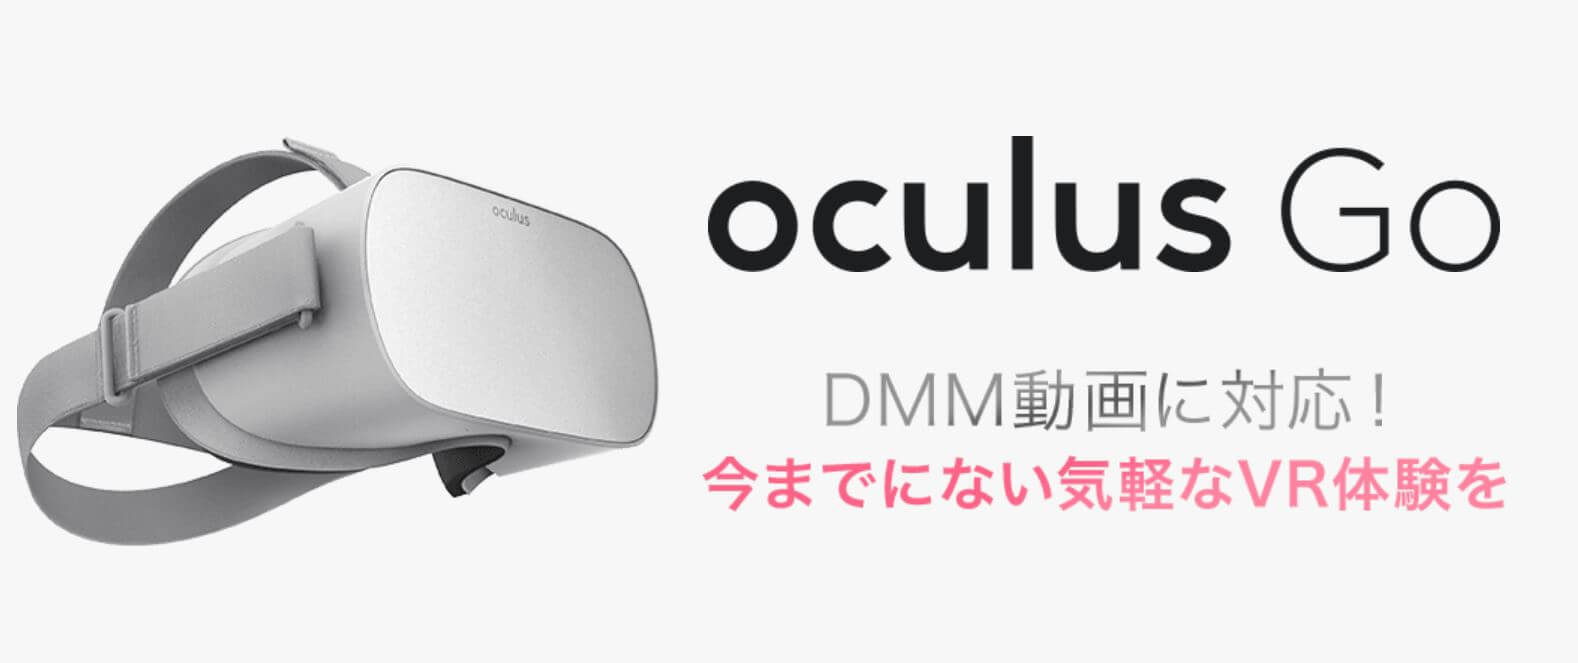 Oculus Go DMMVR対応